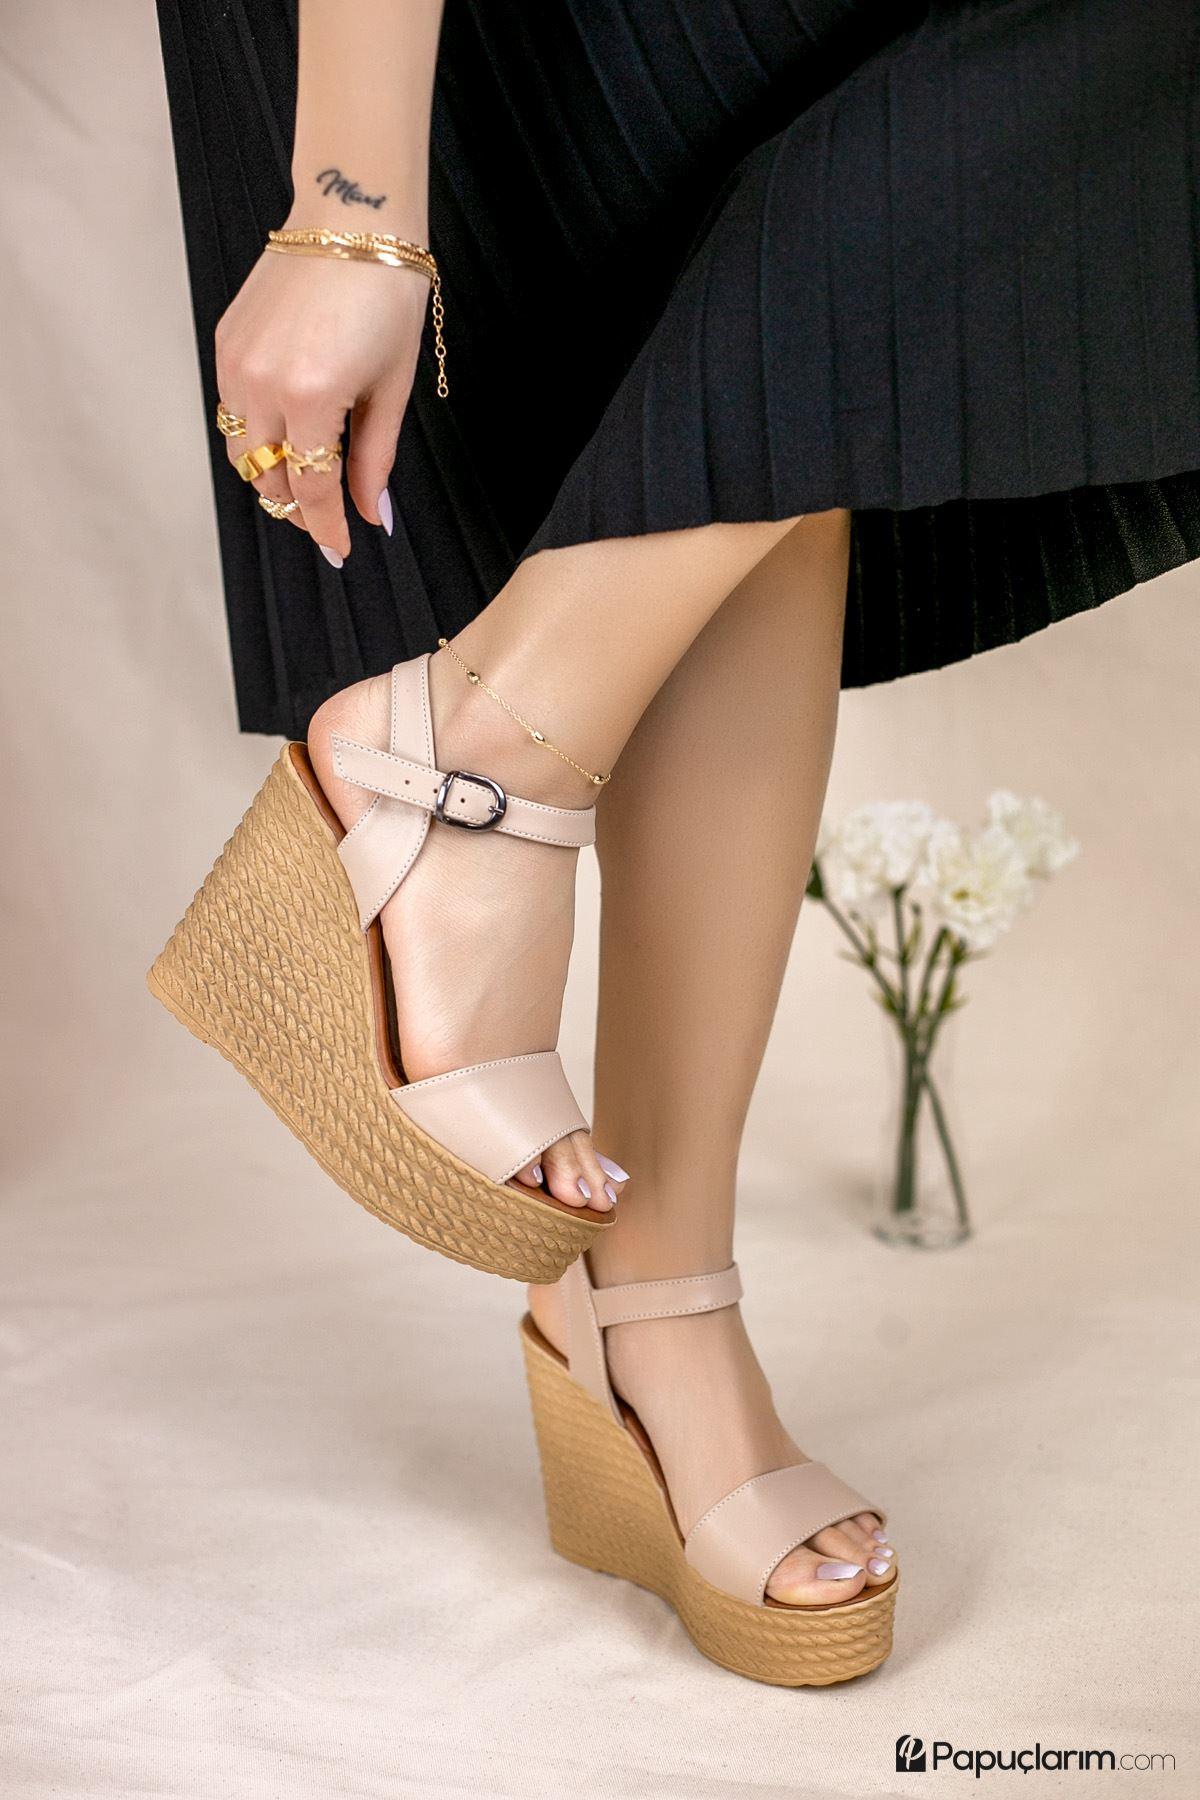 Angie Vizon Mat Deri Dolgu Topuk Kadın Ayakkabı